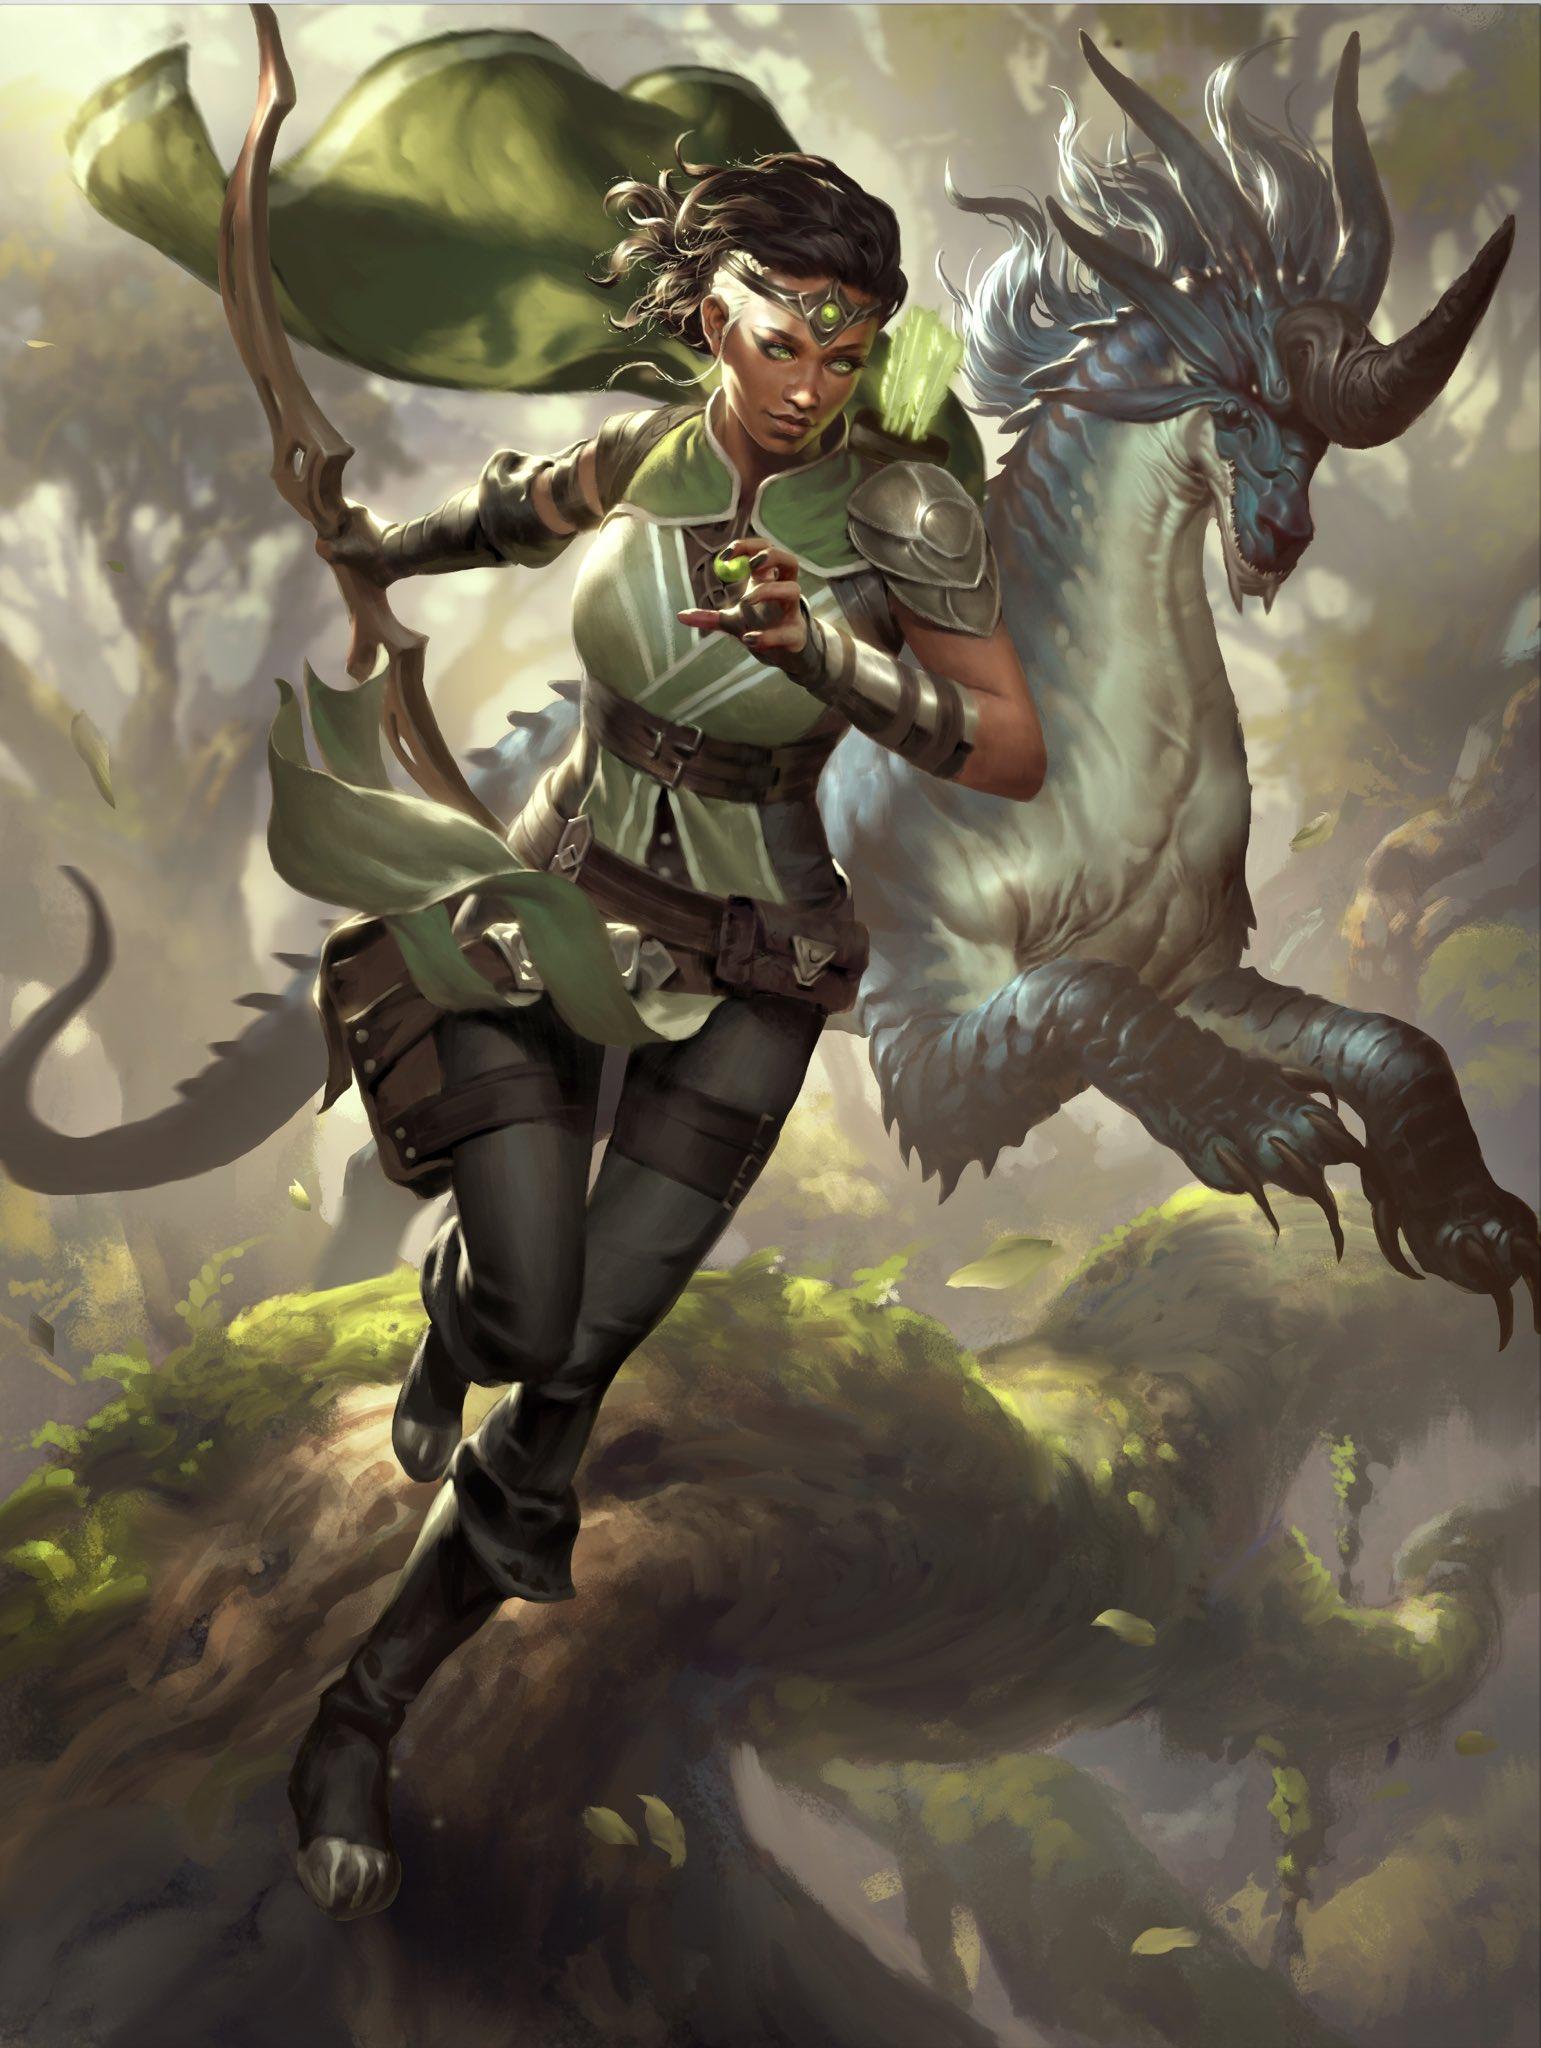 Vivien, Monsters' Advocate | Illustration by Lius Lasahido